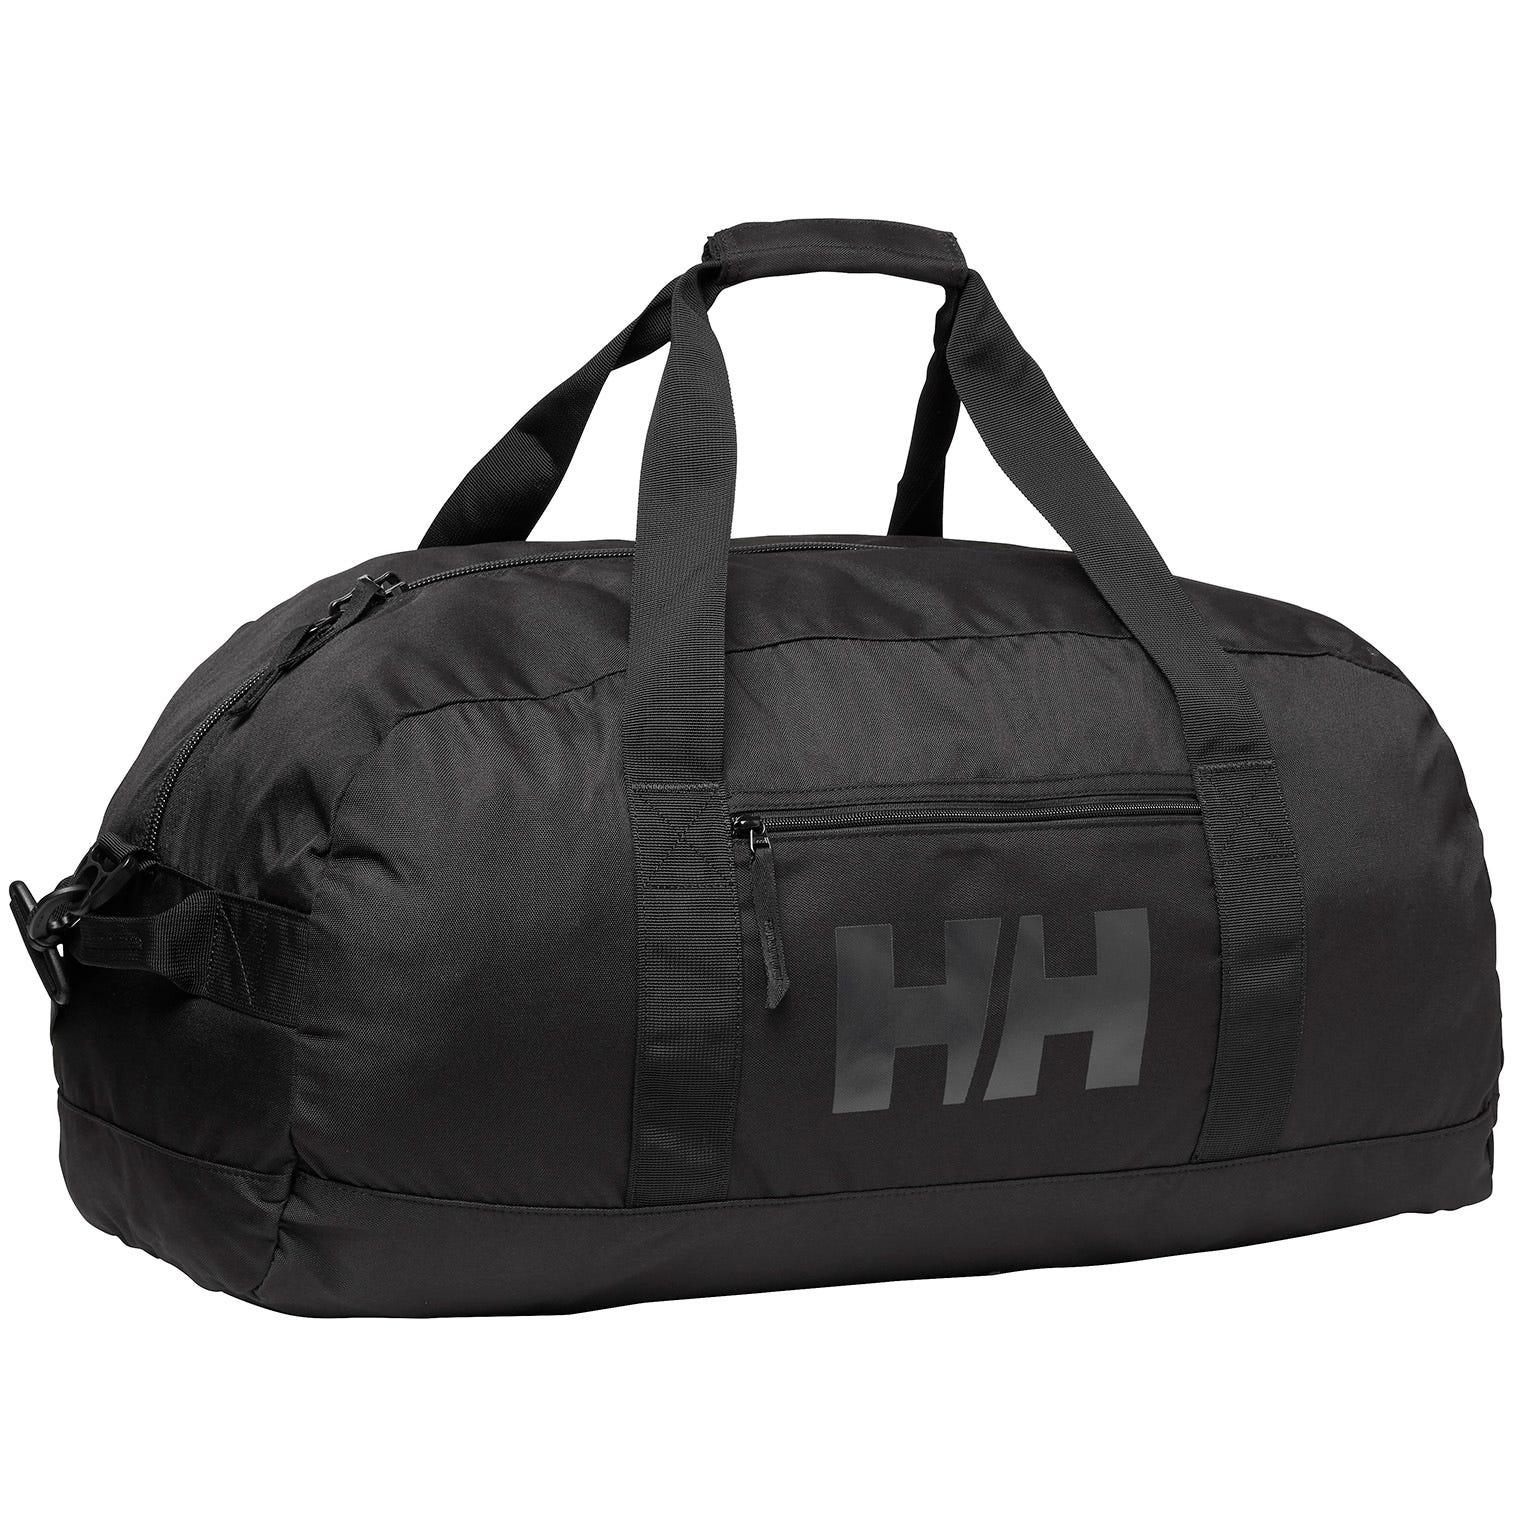 Helly Hansen Sport Duffel 70l - Durable Double Layer Bottom Bag Black STD